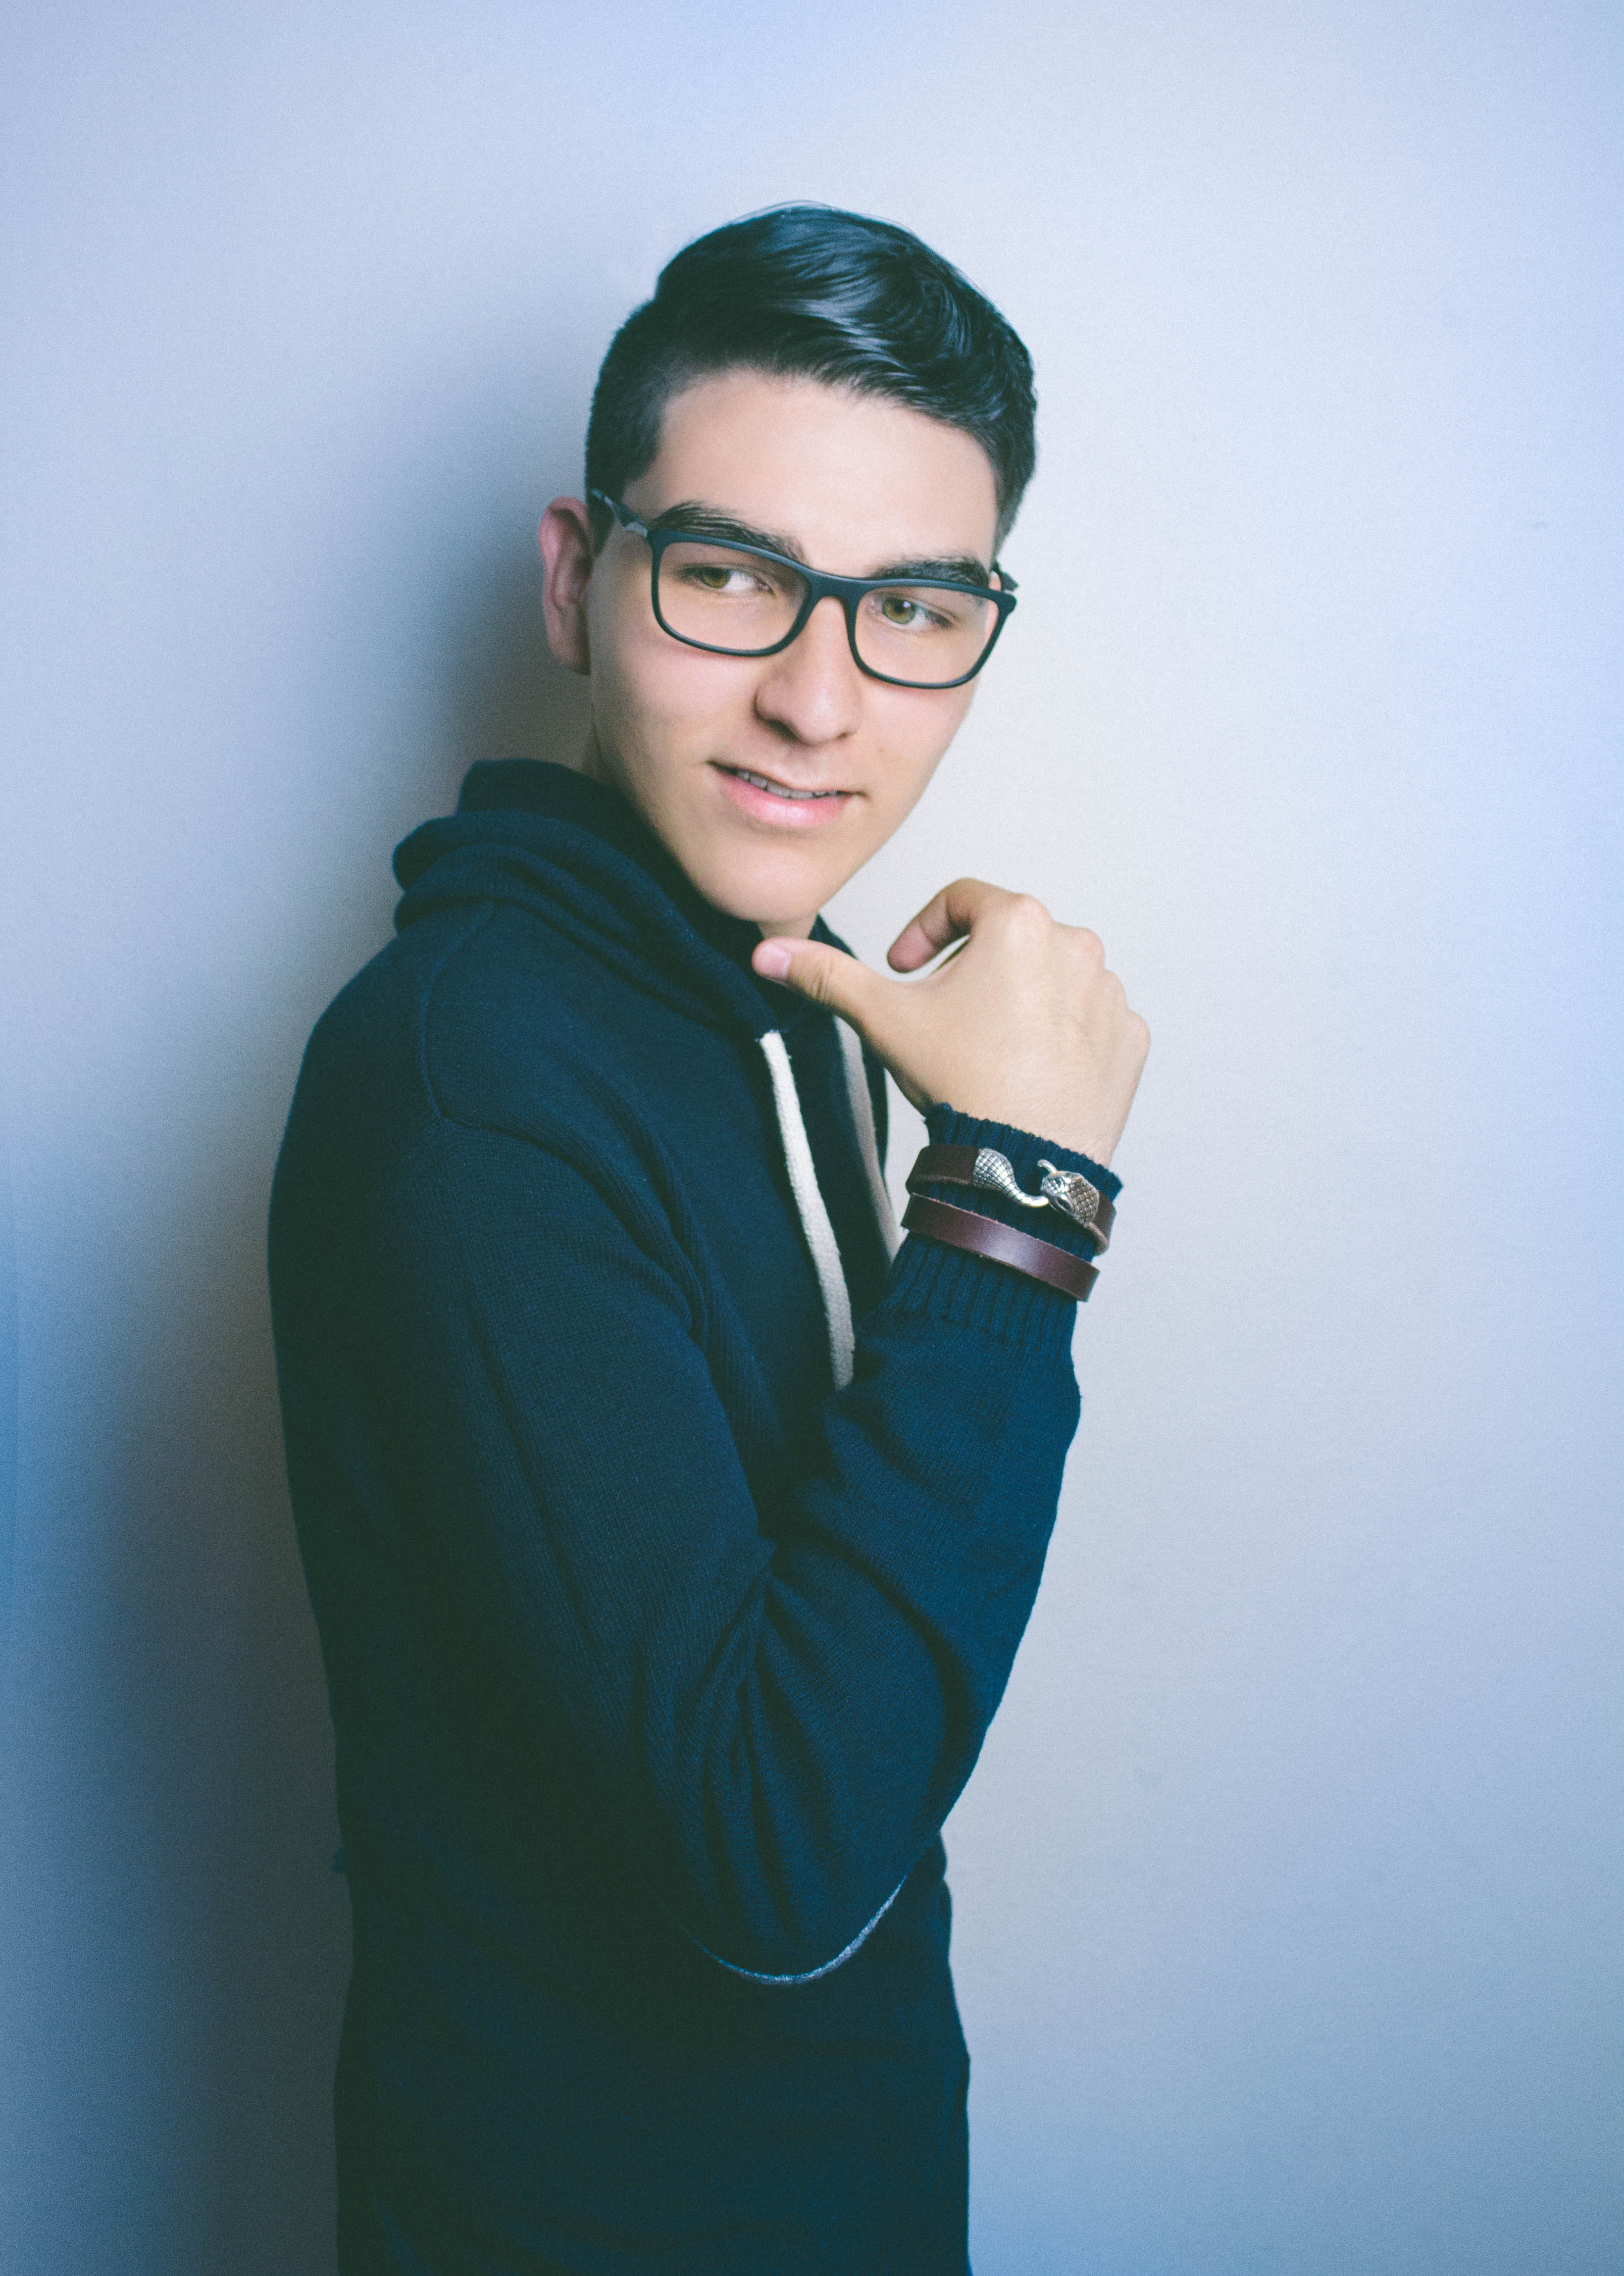 Man in Blue Hooded Jacket and Black Framed Eyeglasses, Smile, Pose, Photoshoot, Smiling, HQ Photo